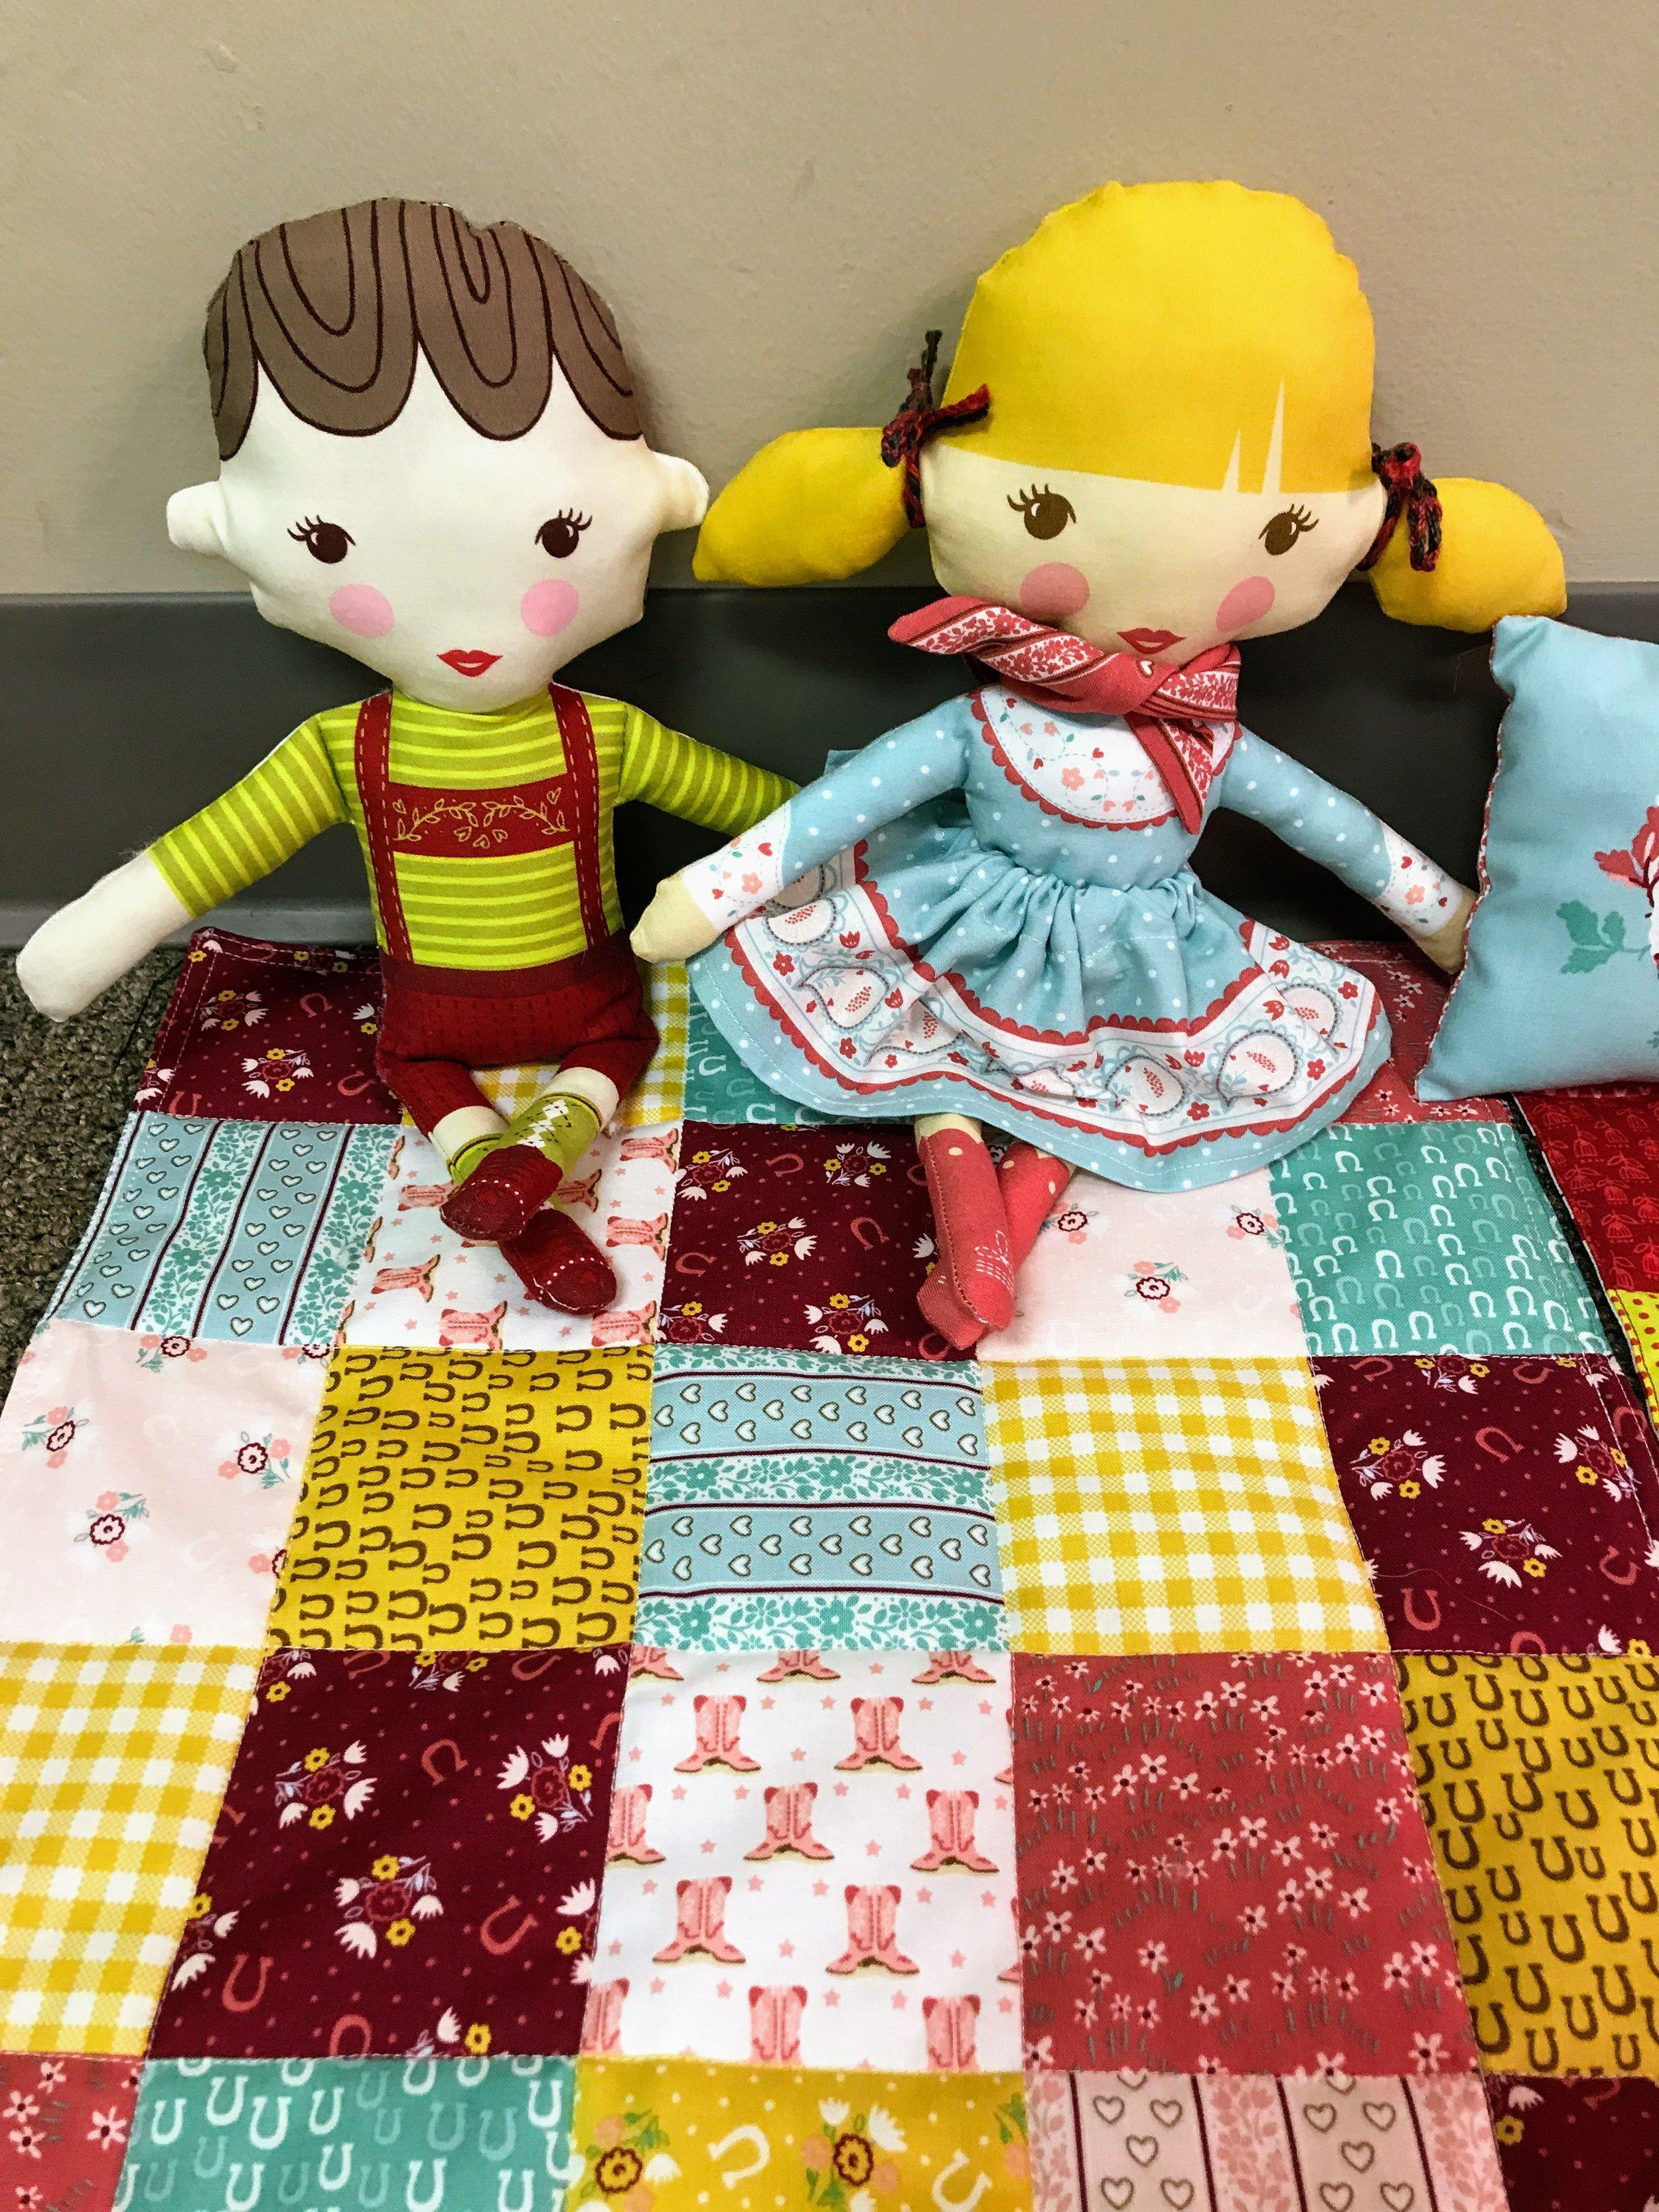 Adorable Moda dolls made by Denise Ohlman